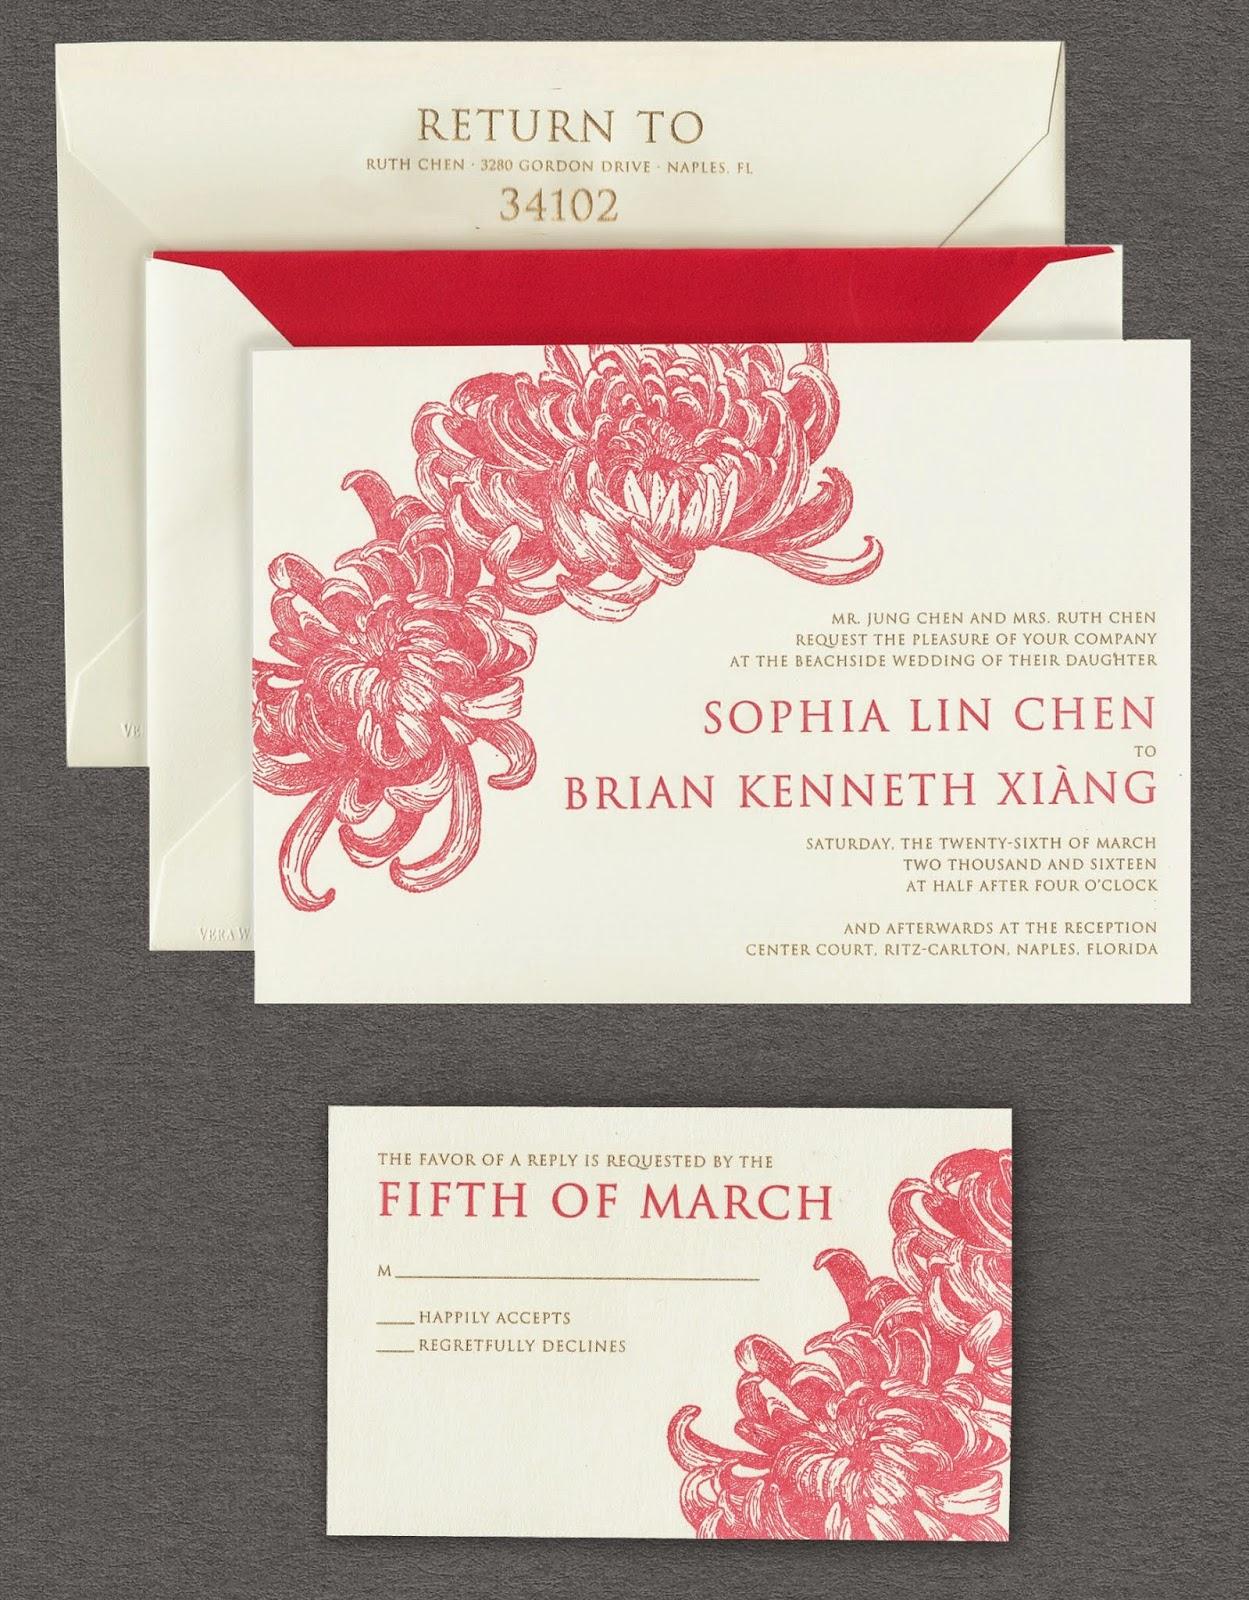 spring awakening invitations for garden wedding perfection - Vera Wang Wedding Invitations